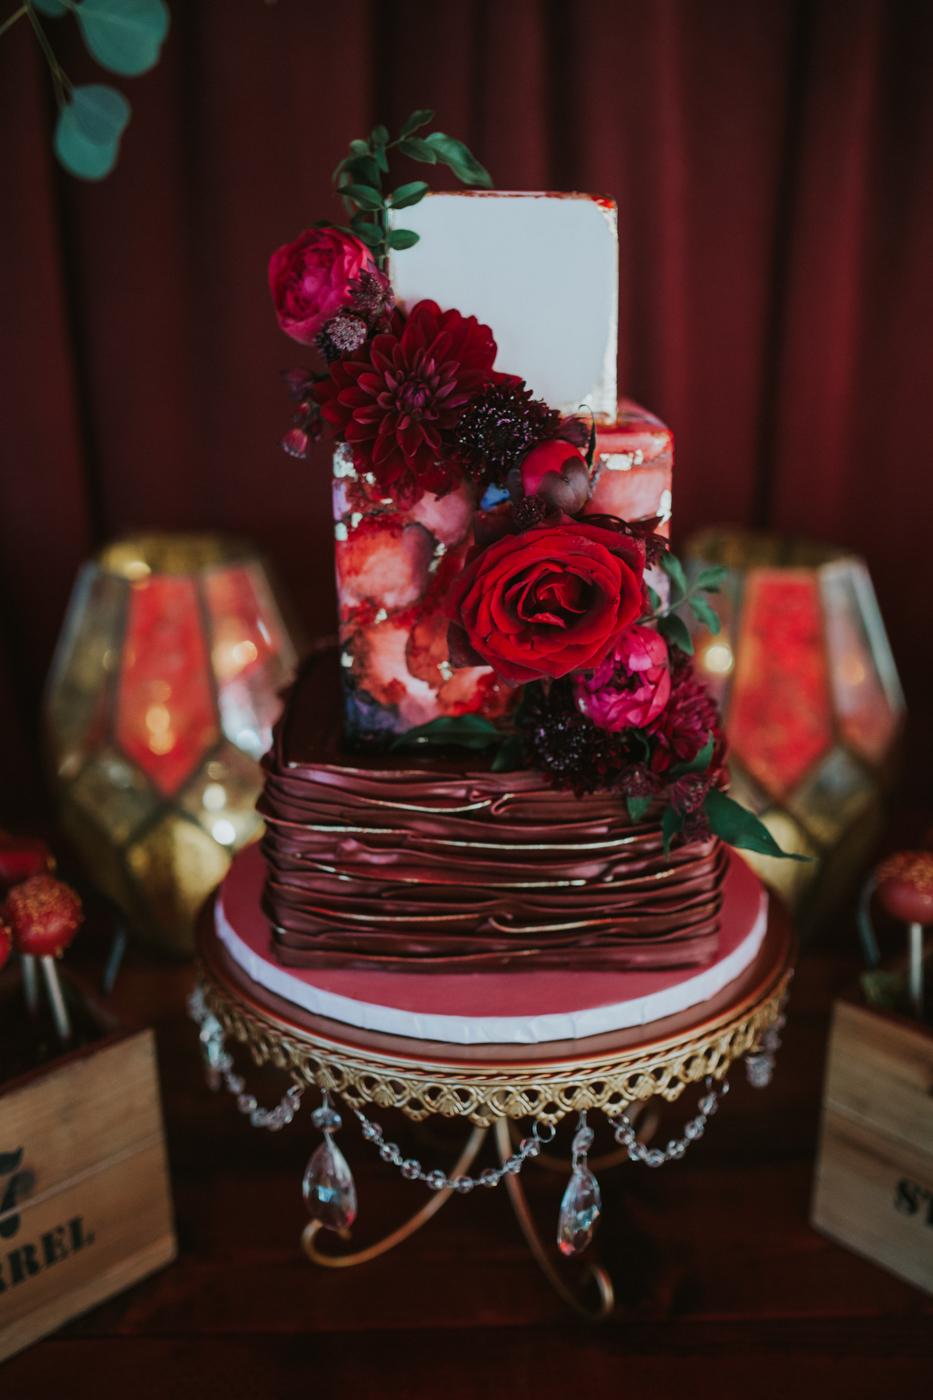 Three tier wedding cake with dark moody colors and flower print wedding cake ideas